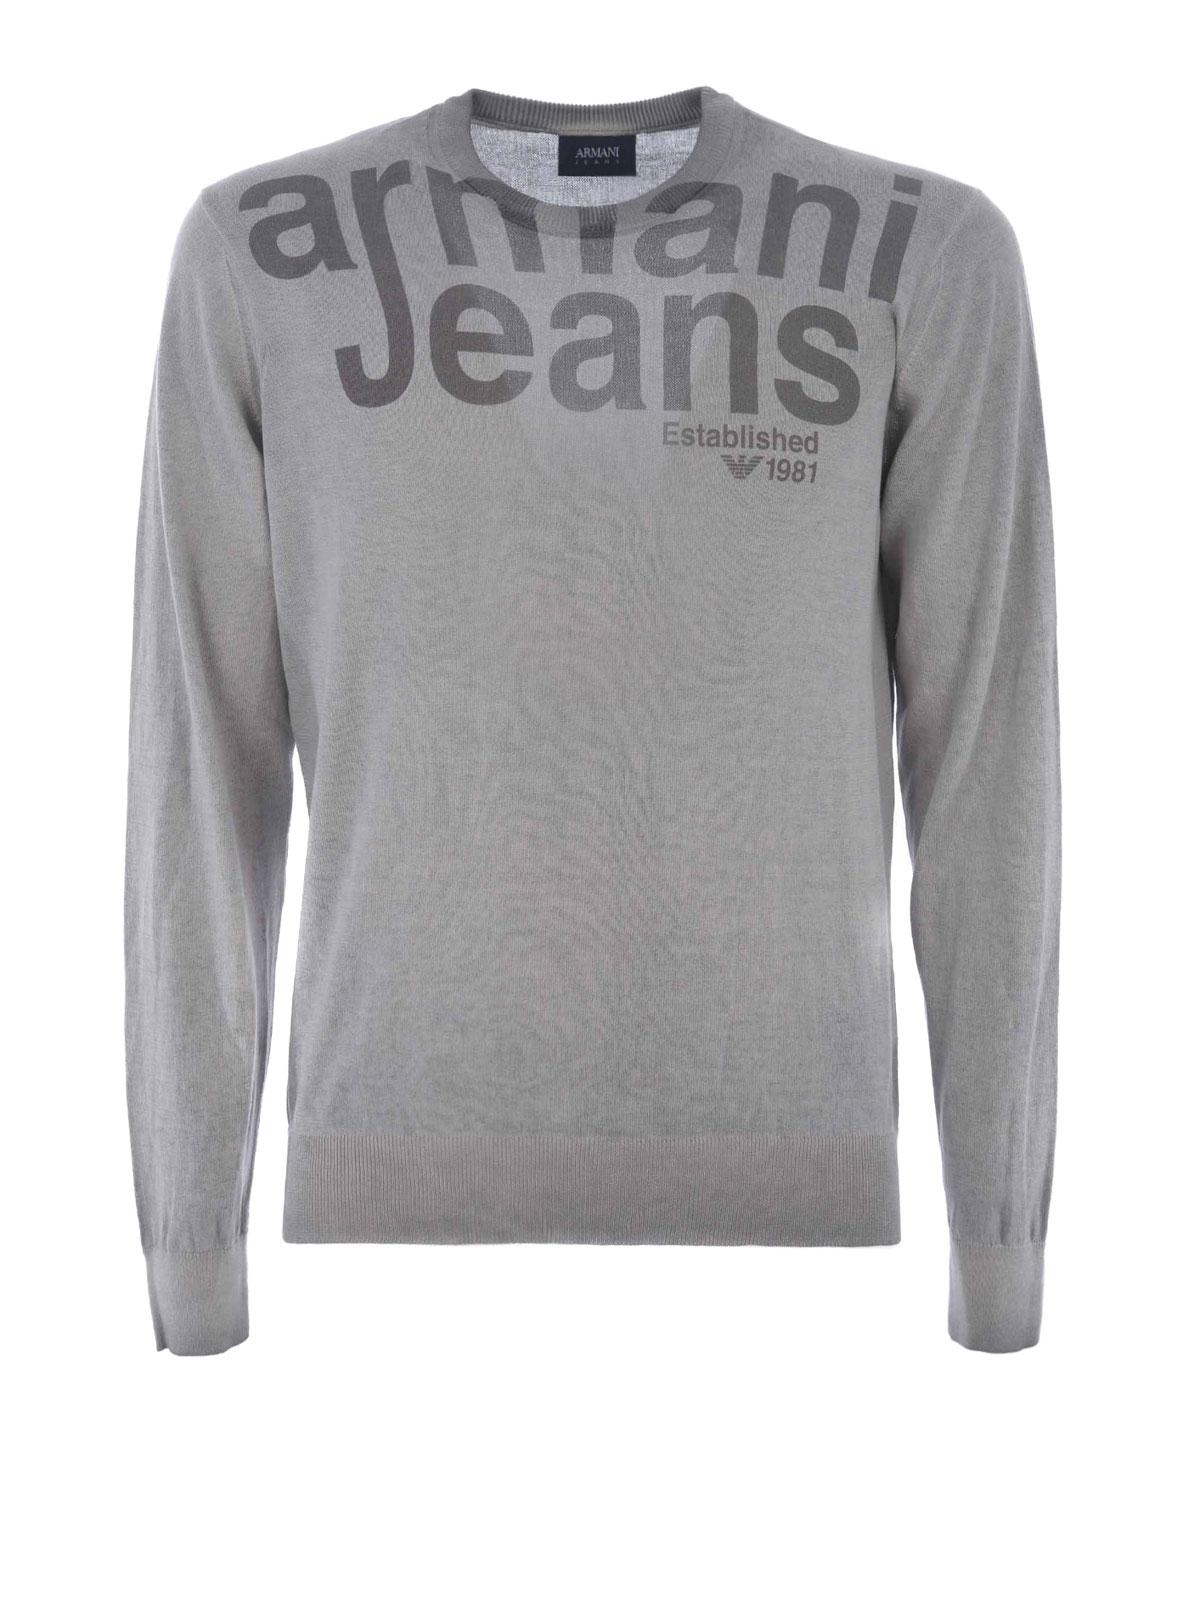 52754fe81e31 Armani Jeans - Sweat-Shirts Et Pulls Gris - Sweatshirts   Pulls ...